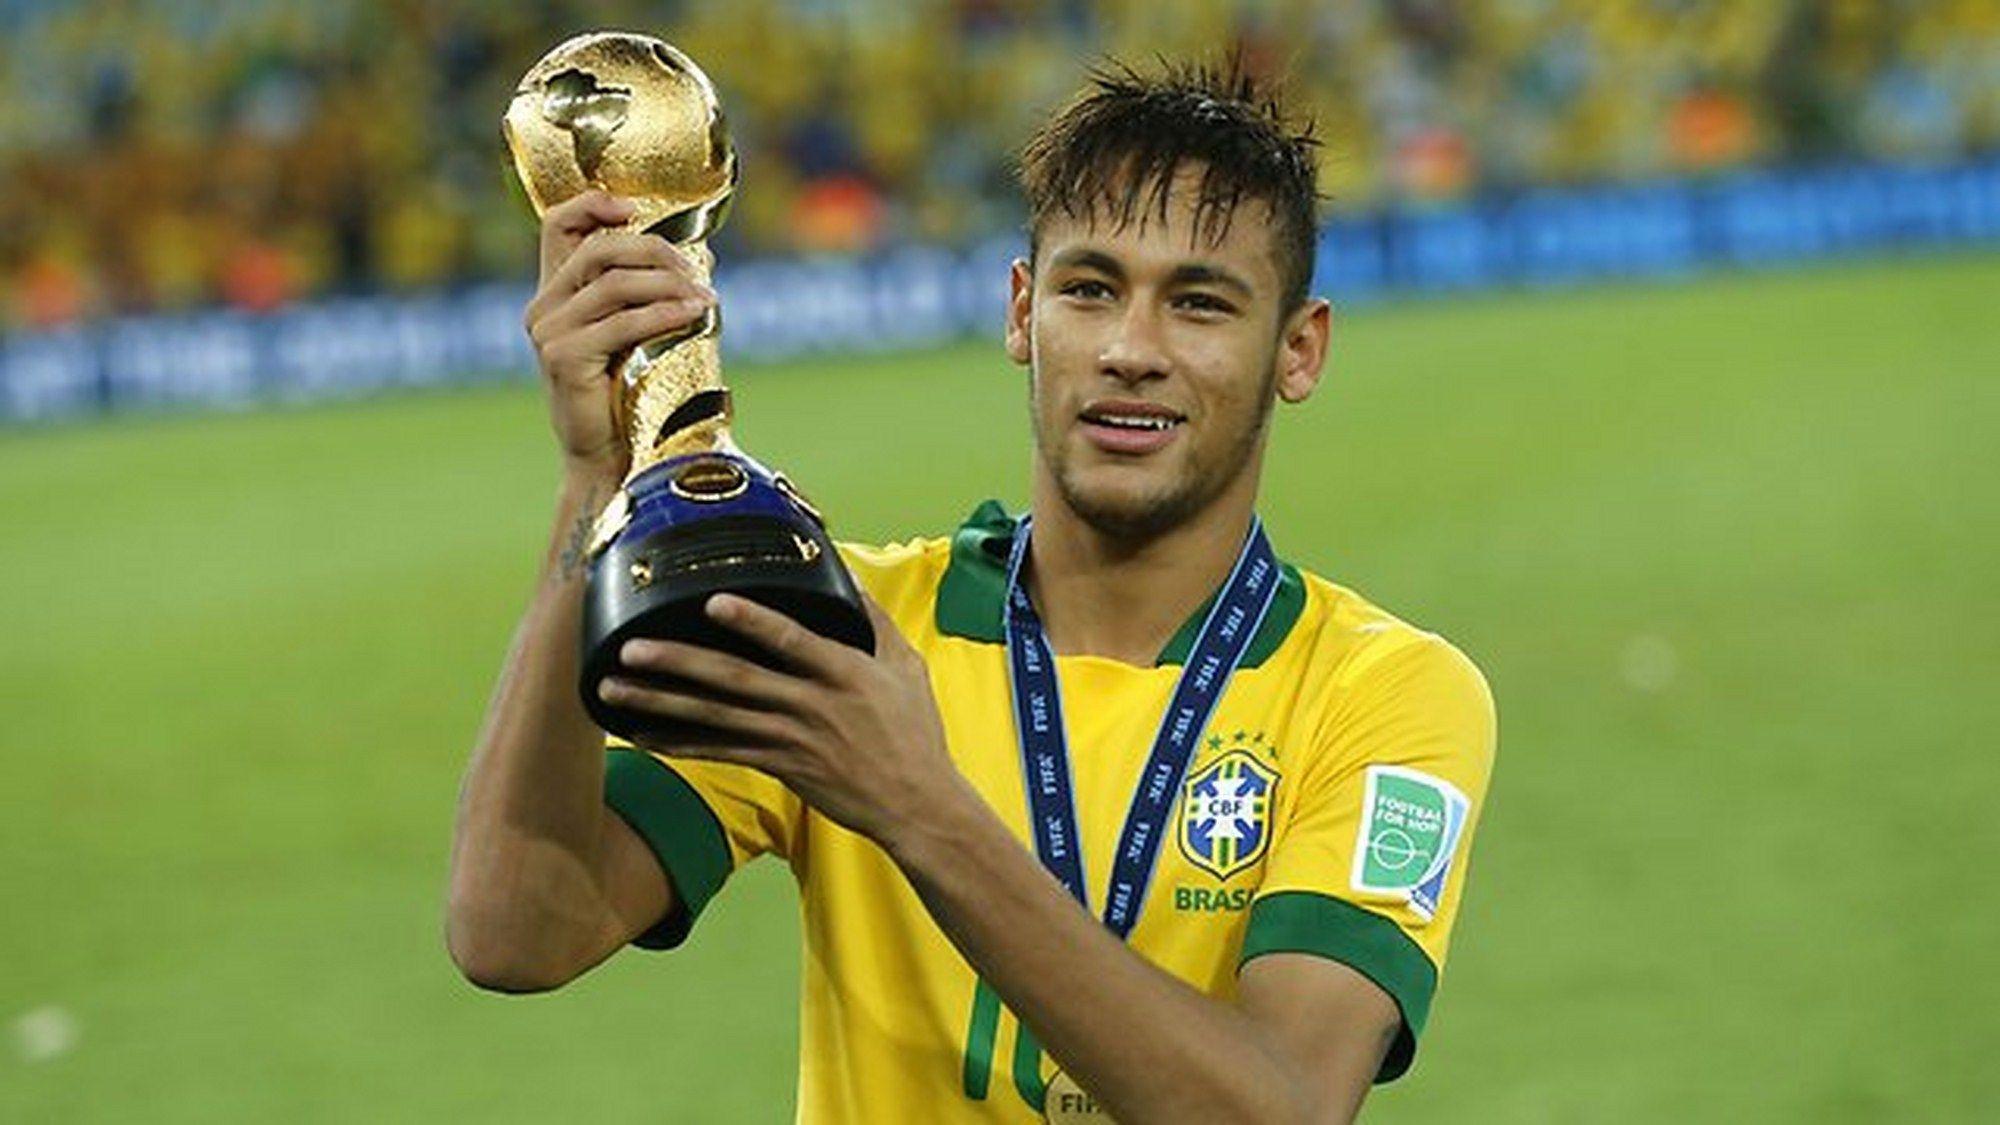 Neymar Baercelona Wallpaper Photo With Hd Wallpaper Resolution 1600 900 Neymar Wallpaper 53 Wallpapers Adorable Wallpapers Neymar Neymar Jr World Cup